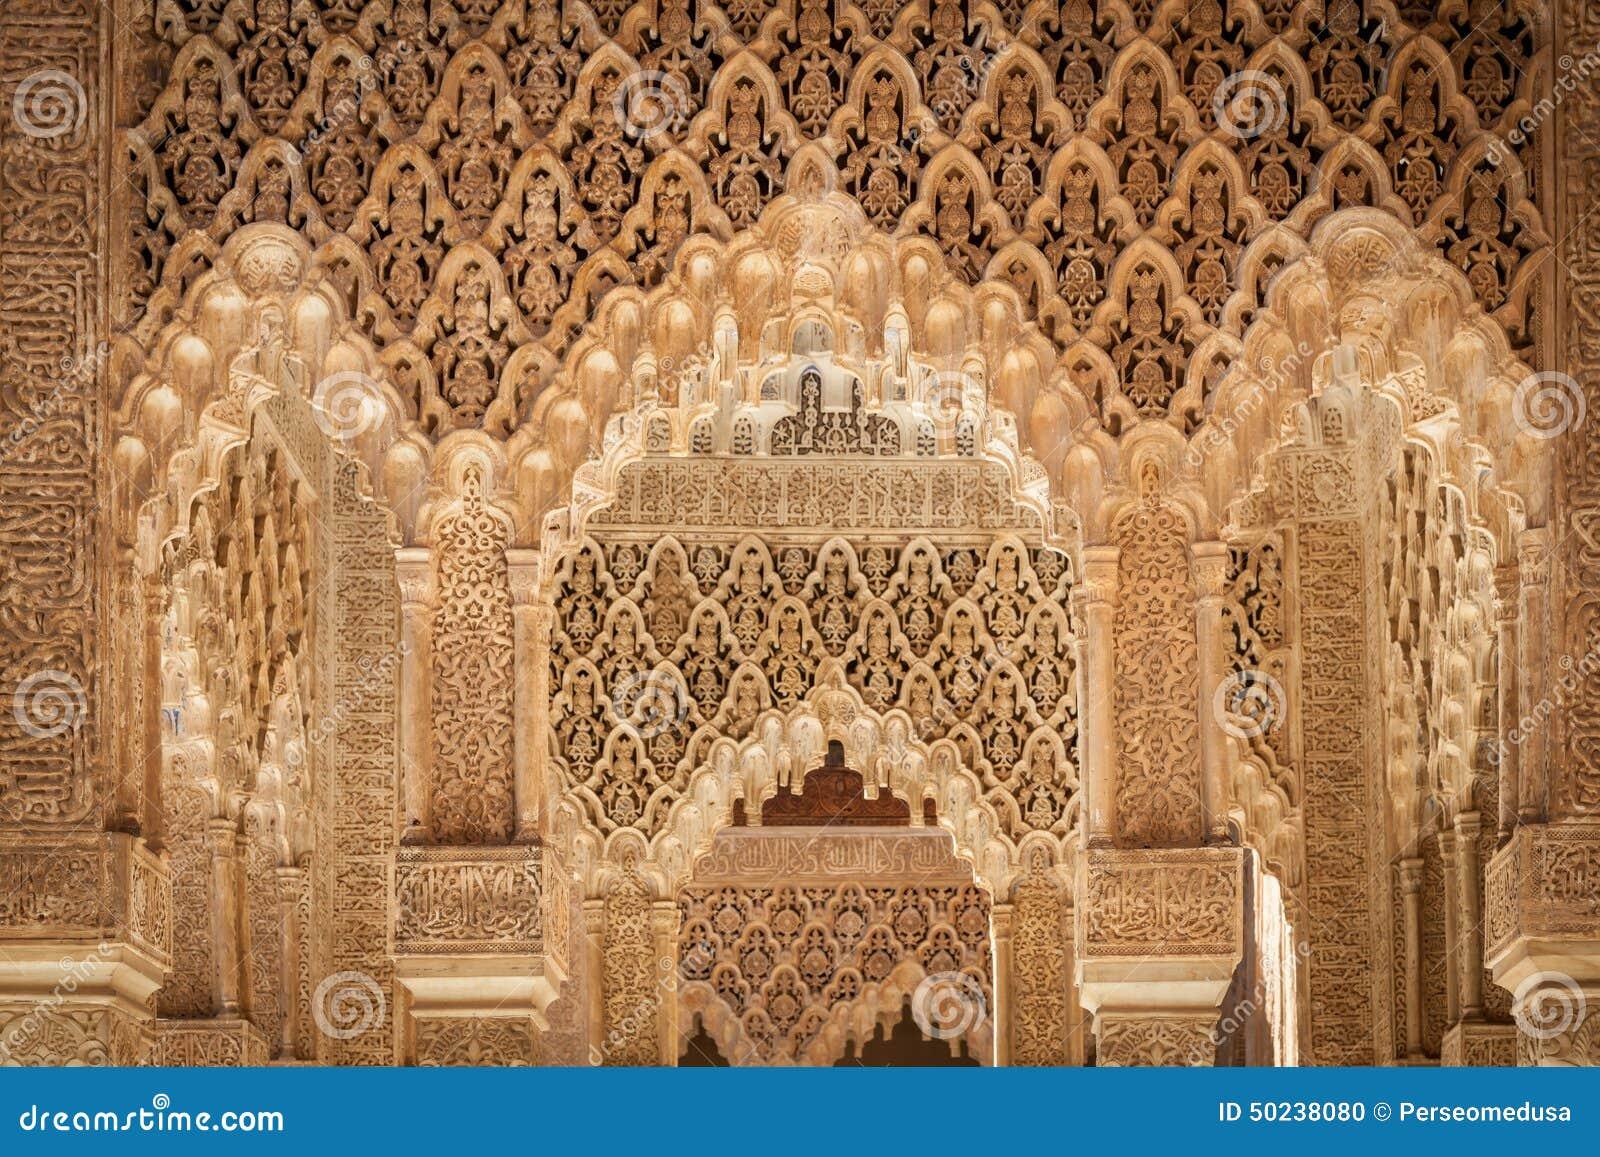 Islamic Palace Interior Stock Photo Image 50238080